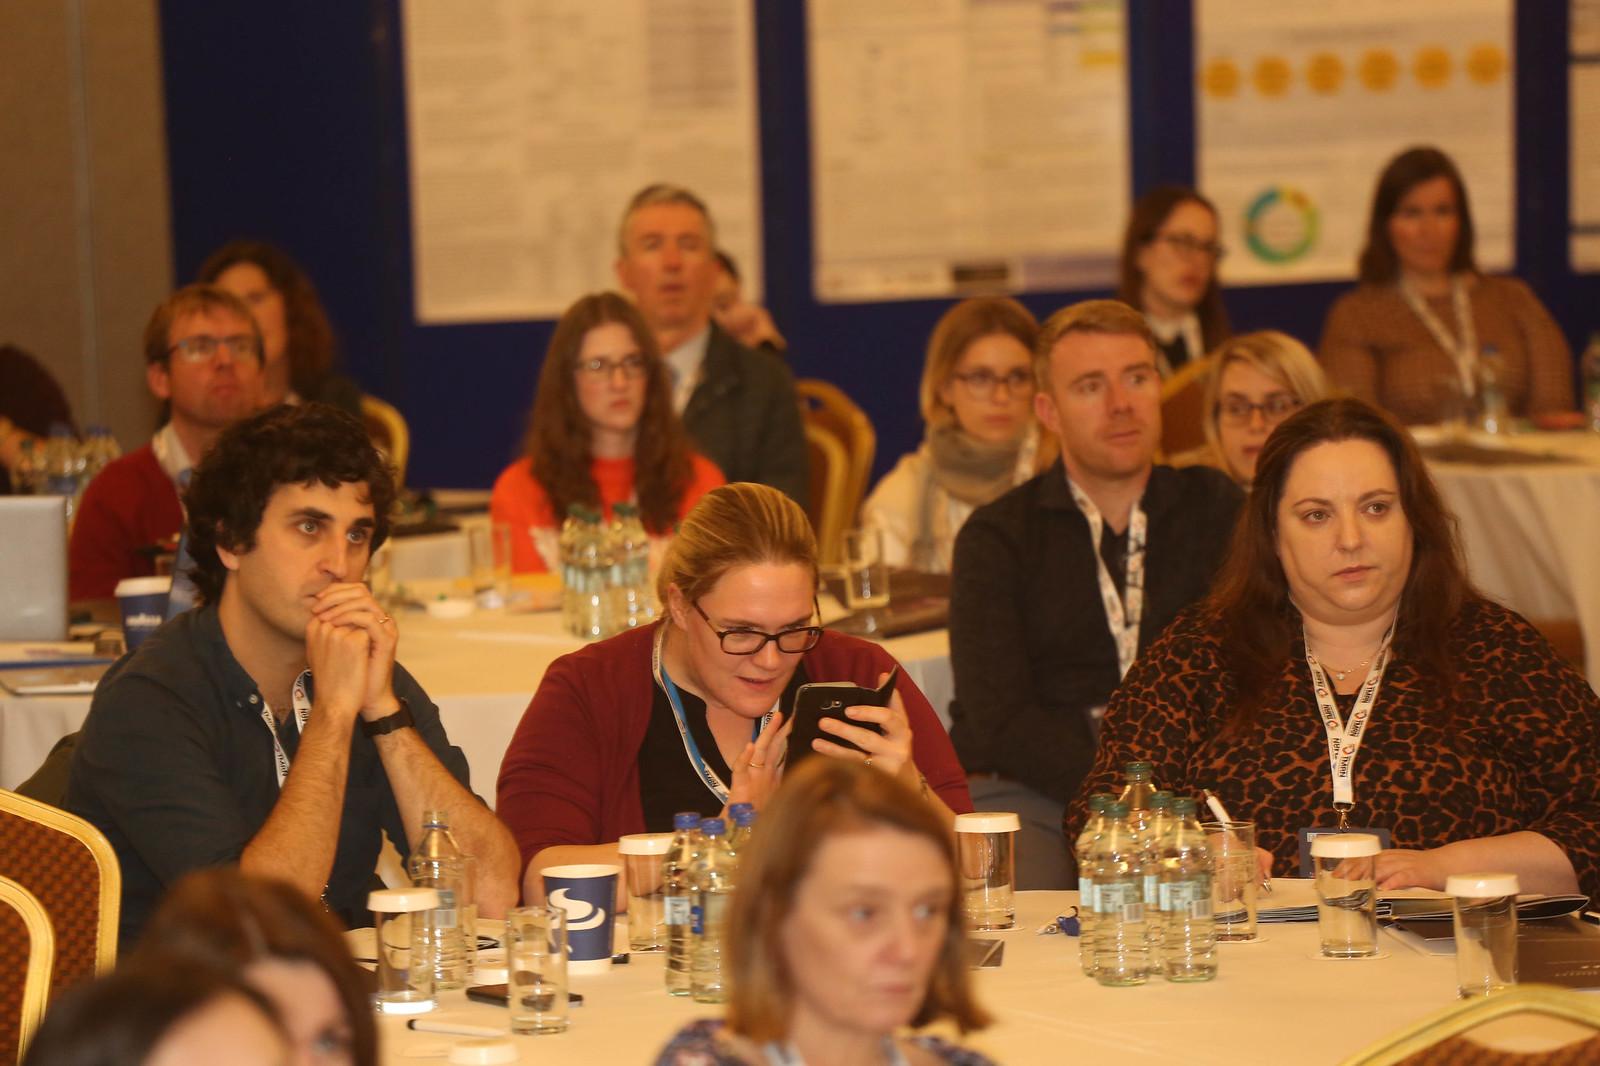 4th Annual Trial Methodology Symposium - 2018 Galway